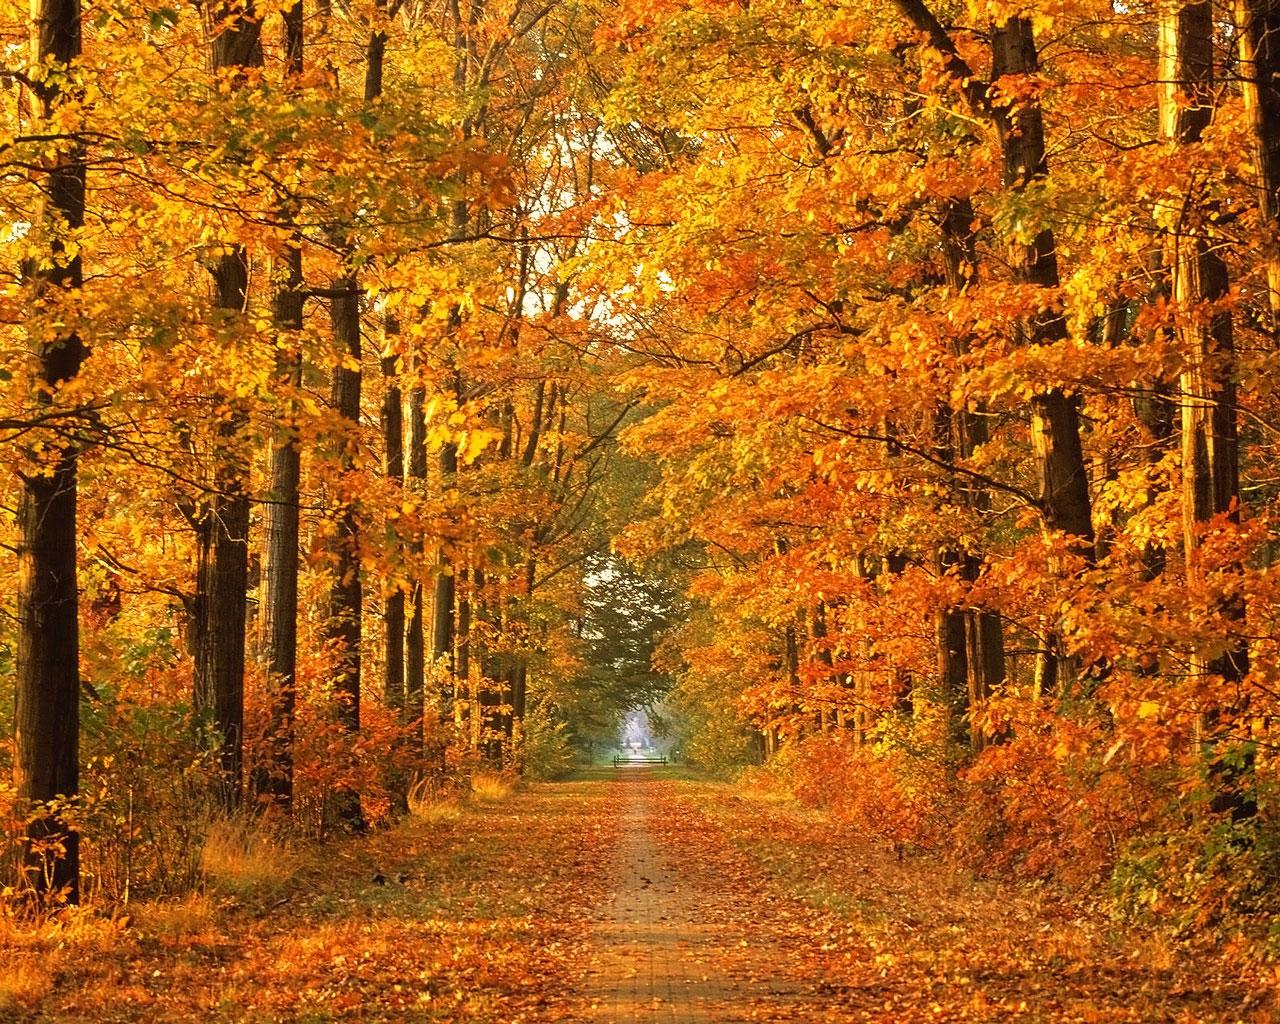 Autumn Season Wallpaperswallpapers Screensavers